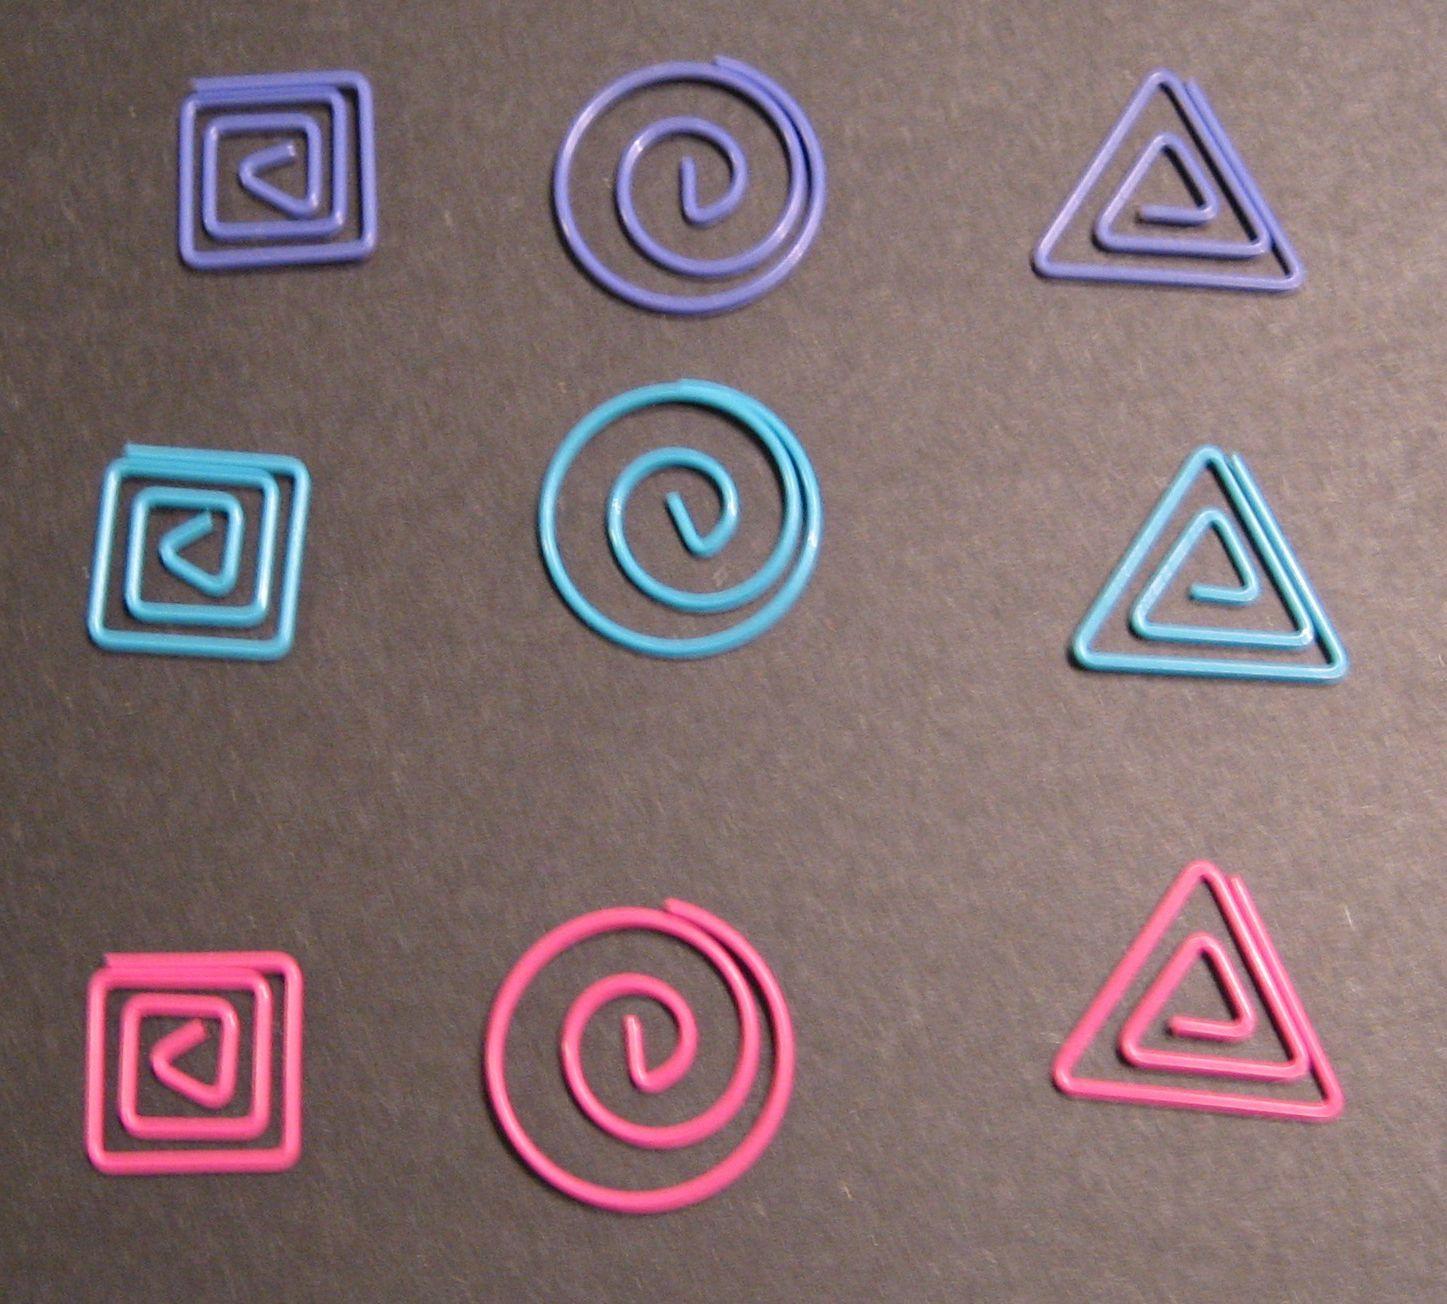 paper-clip-table-4b.jpg